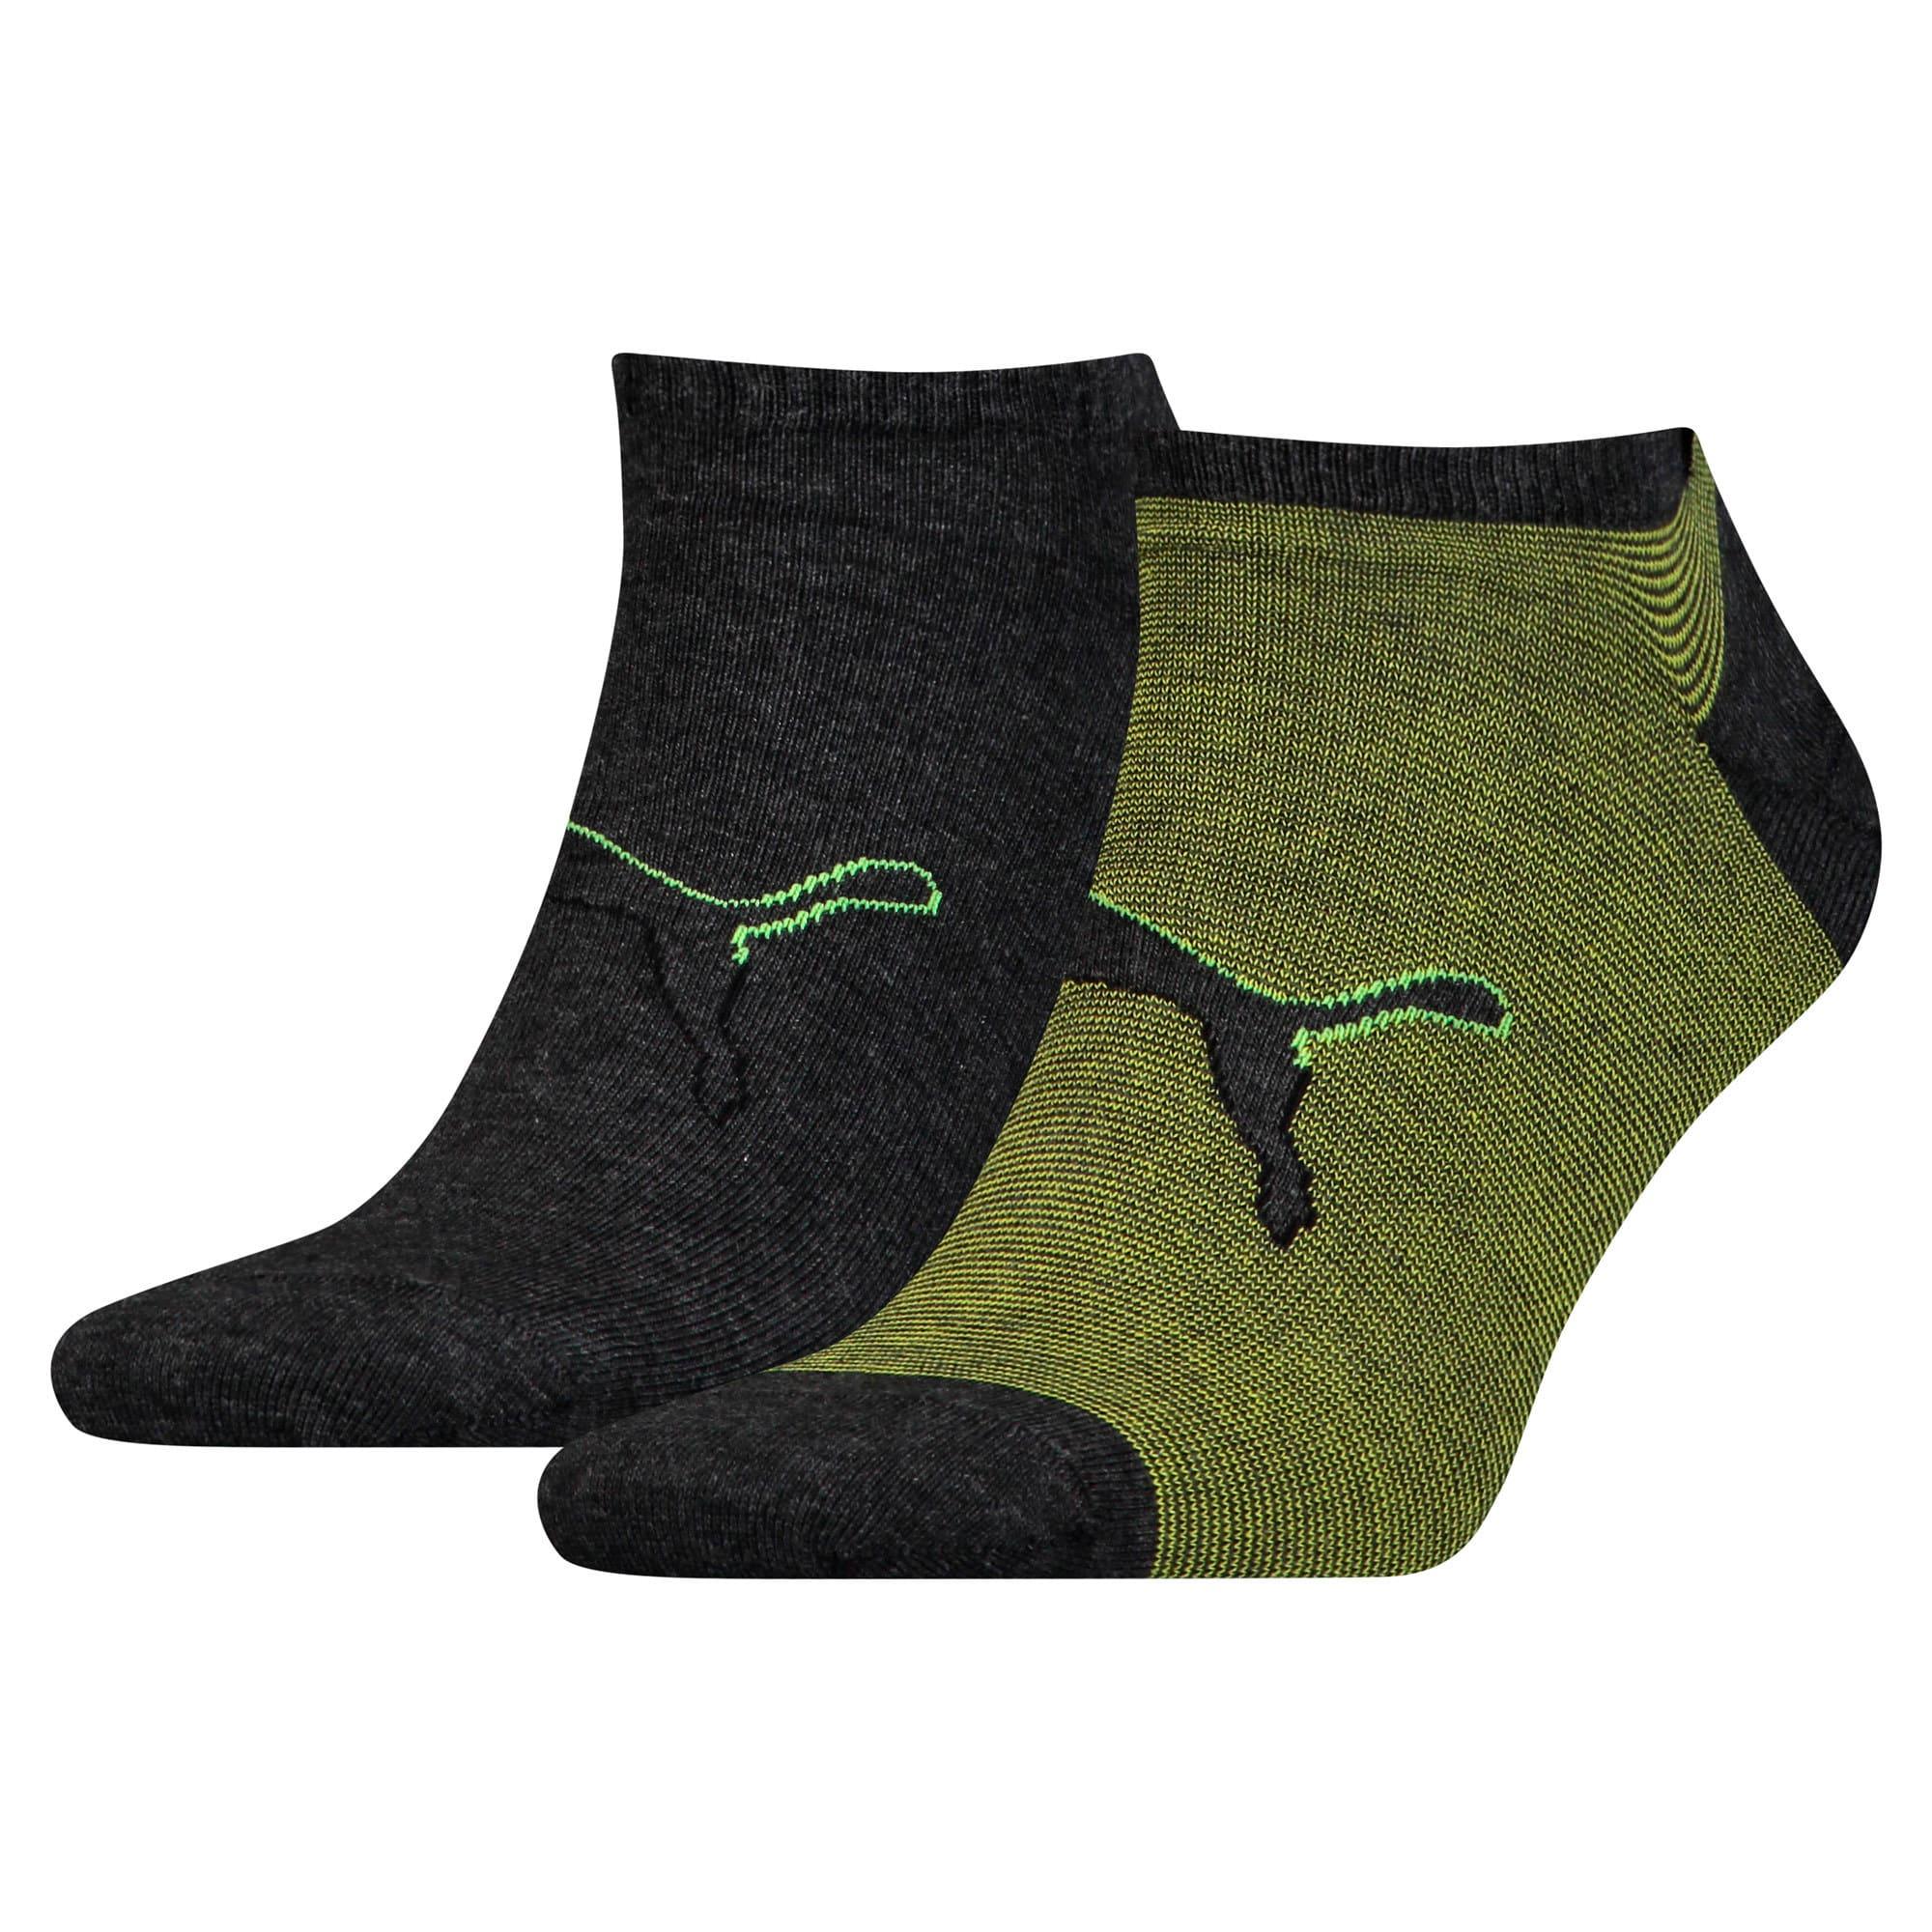 Thumbnail 1 of Big Cat Trainer Socks 2 Pack, black / yellow, medium